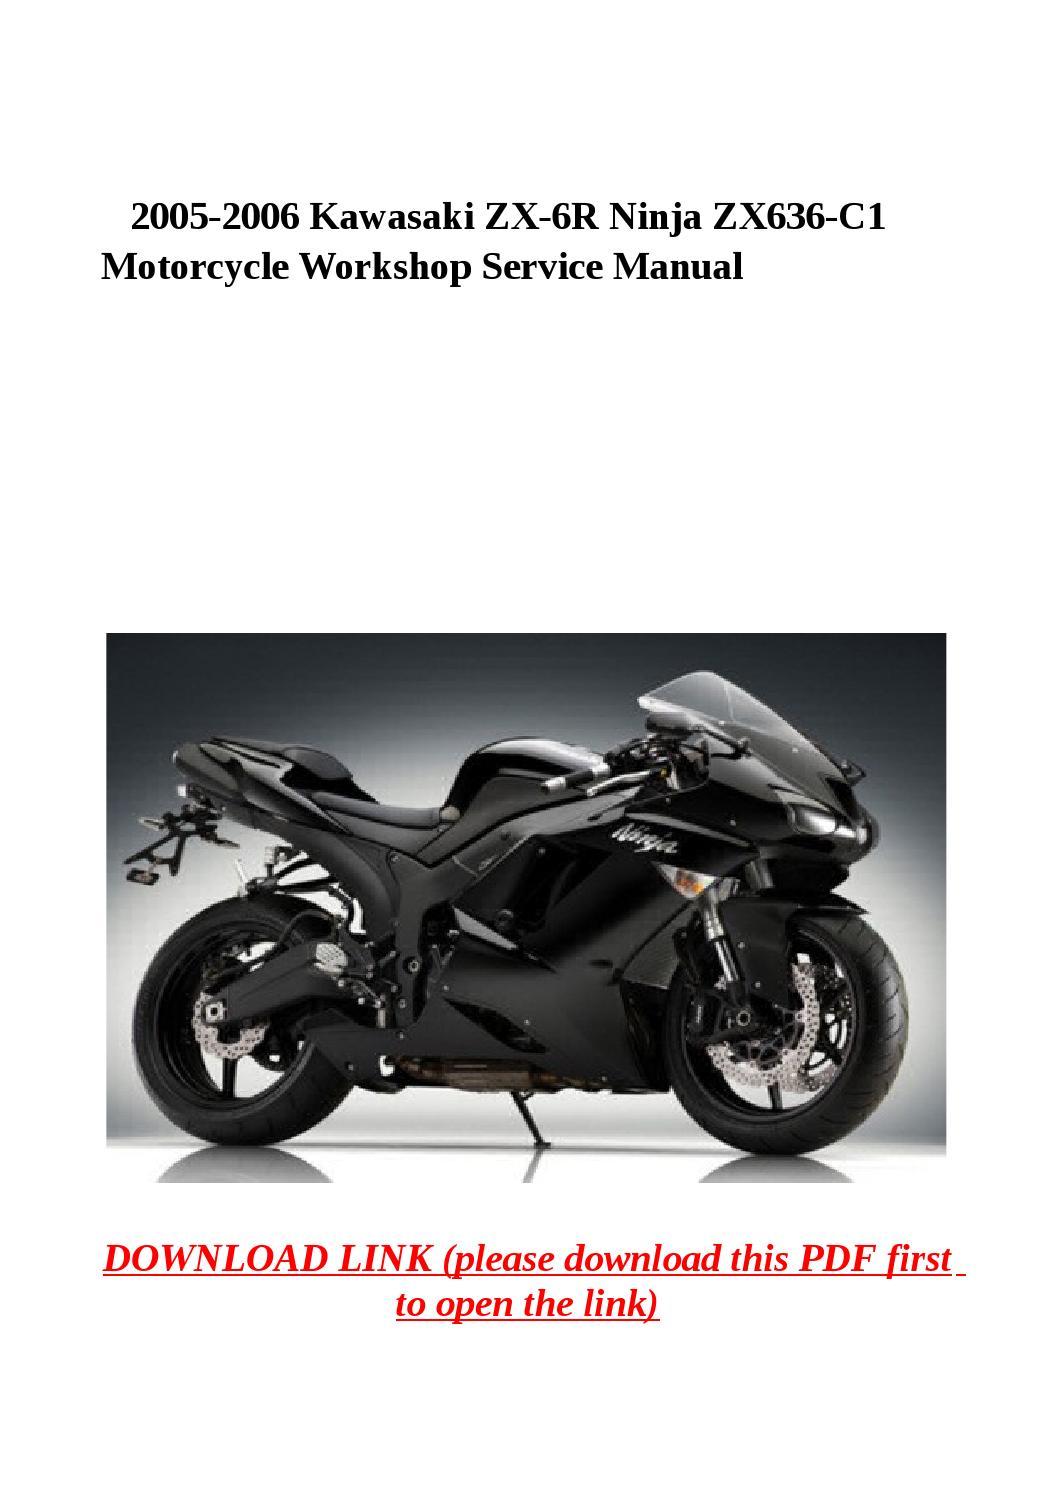 kawasaki zx636 2005 workshop service repair manual